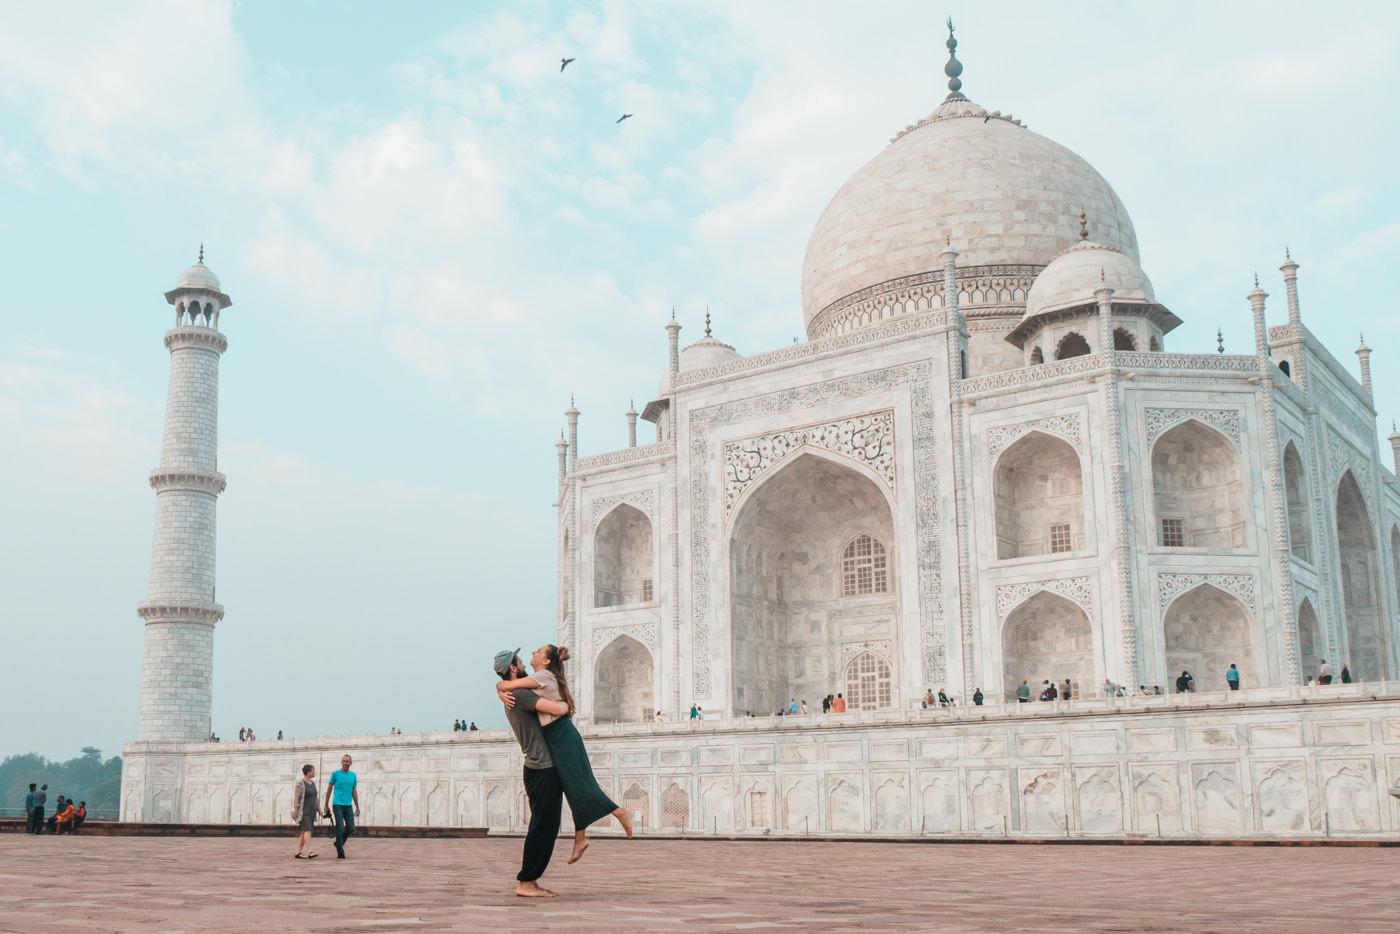 Wir vor dem Taj Mahal in Agra